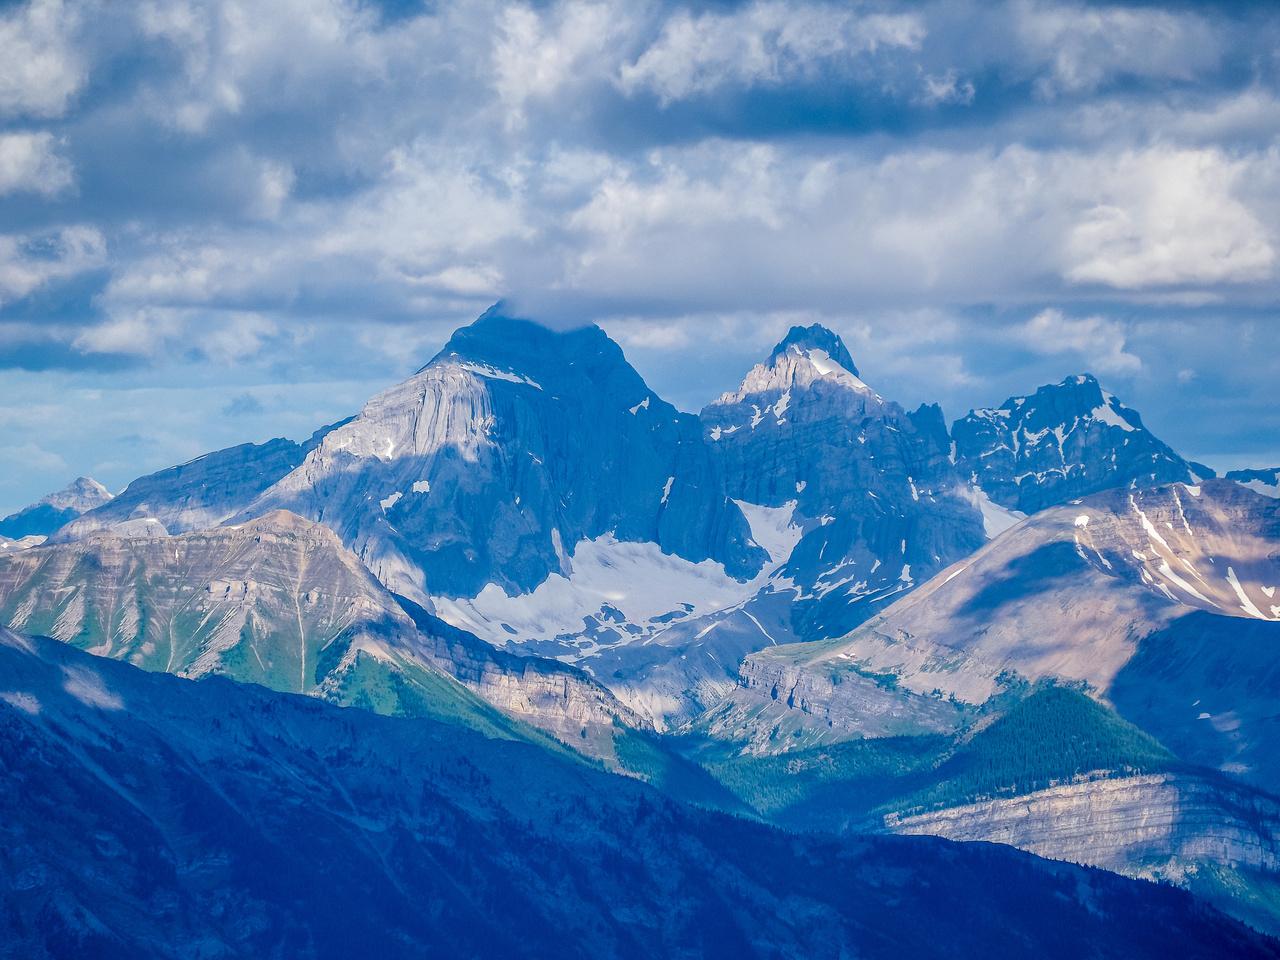 Mount Cadorna, Battisti and Stilleto Peak.